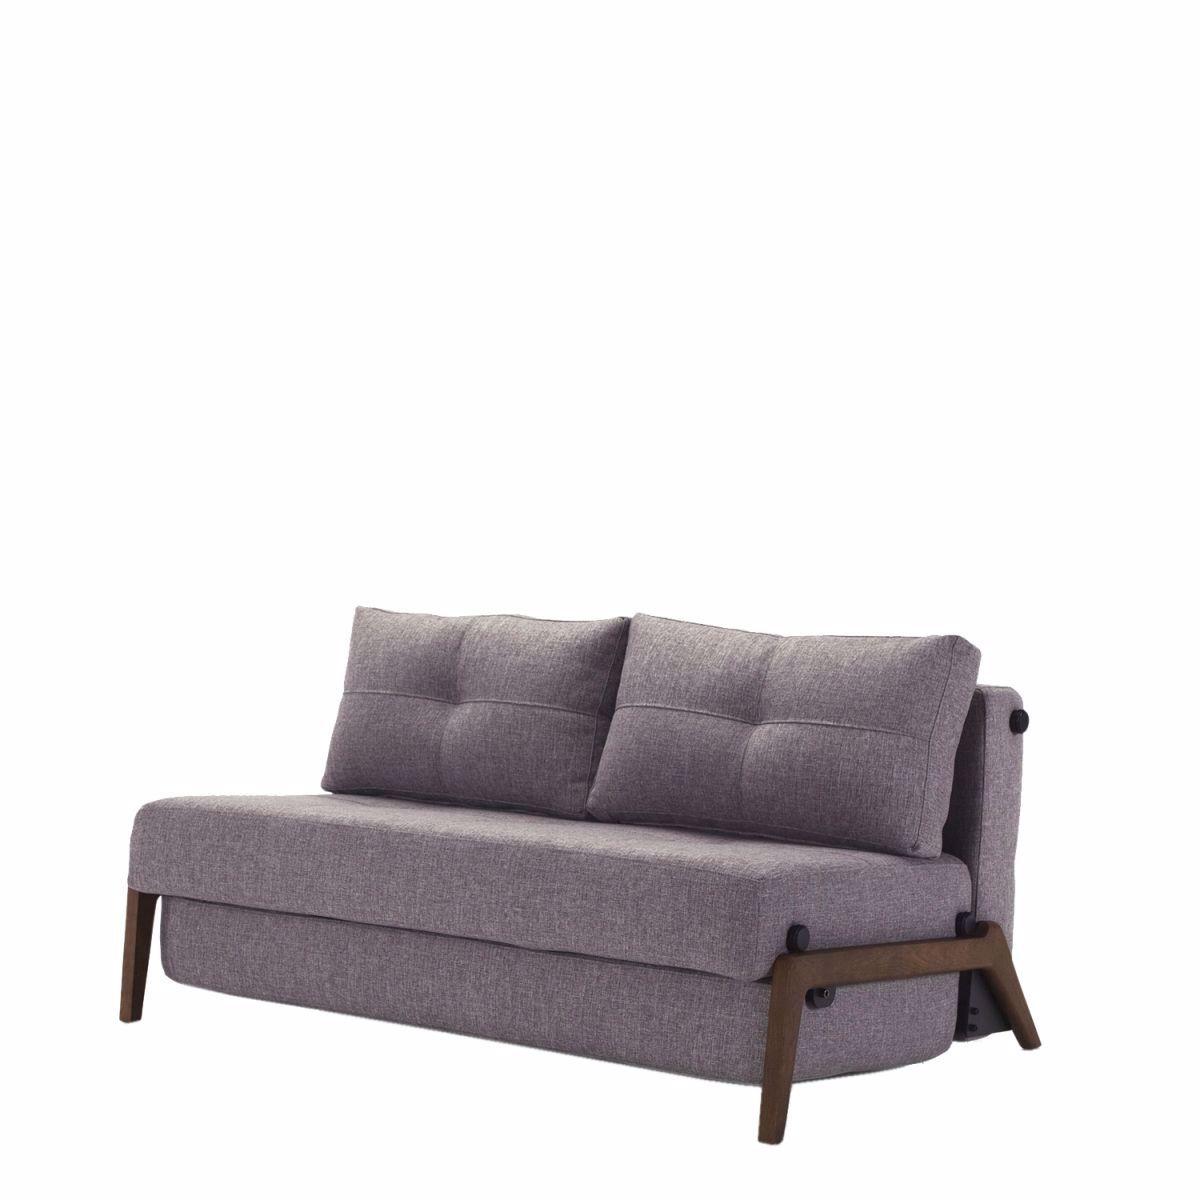 Cubed Sofa Bed   Living Room Furniture   INspiration ...